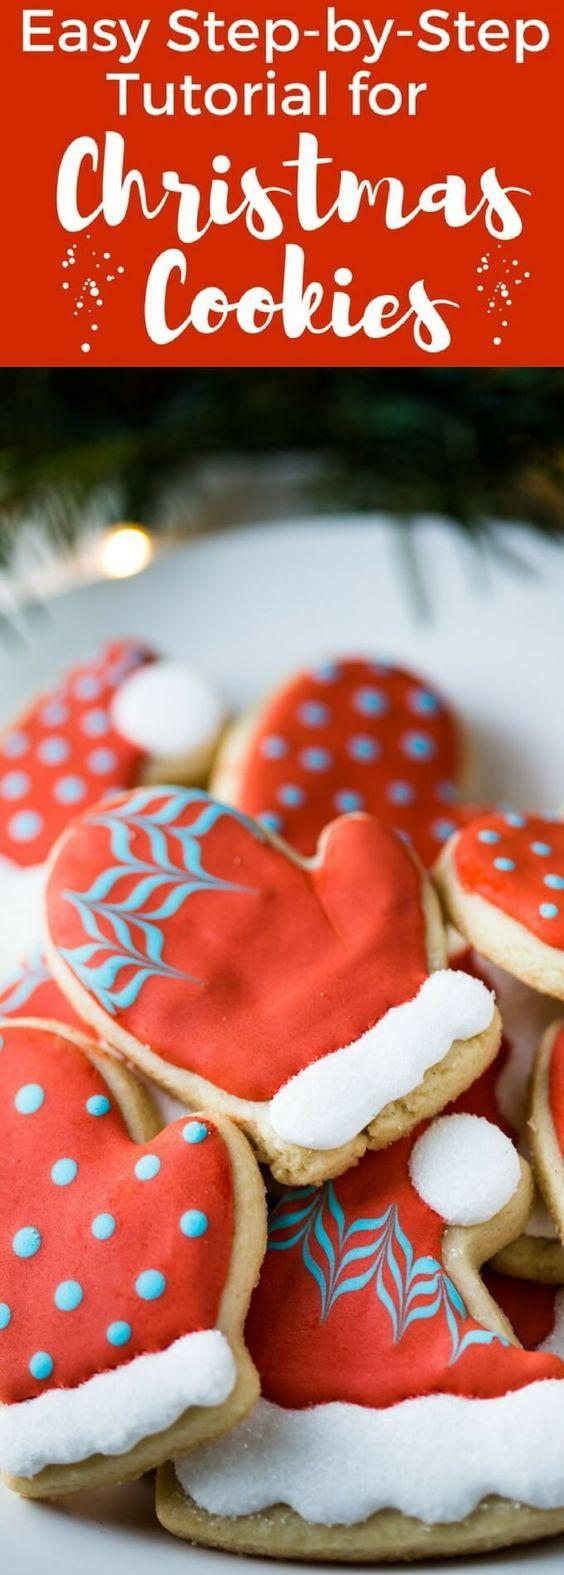 Easy Christmas Cookies Pinterest  Pinterest • The world's catalog of ideas